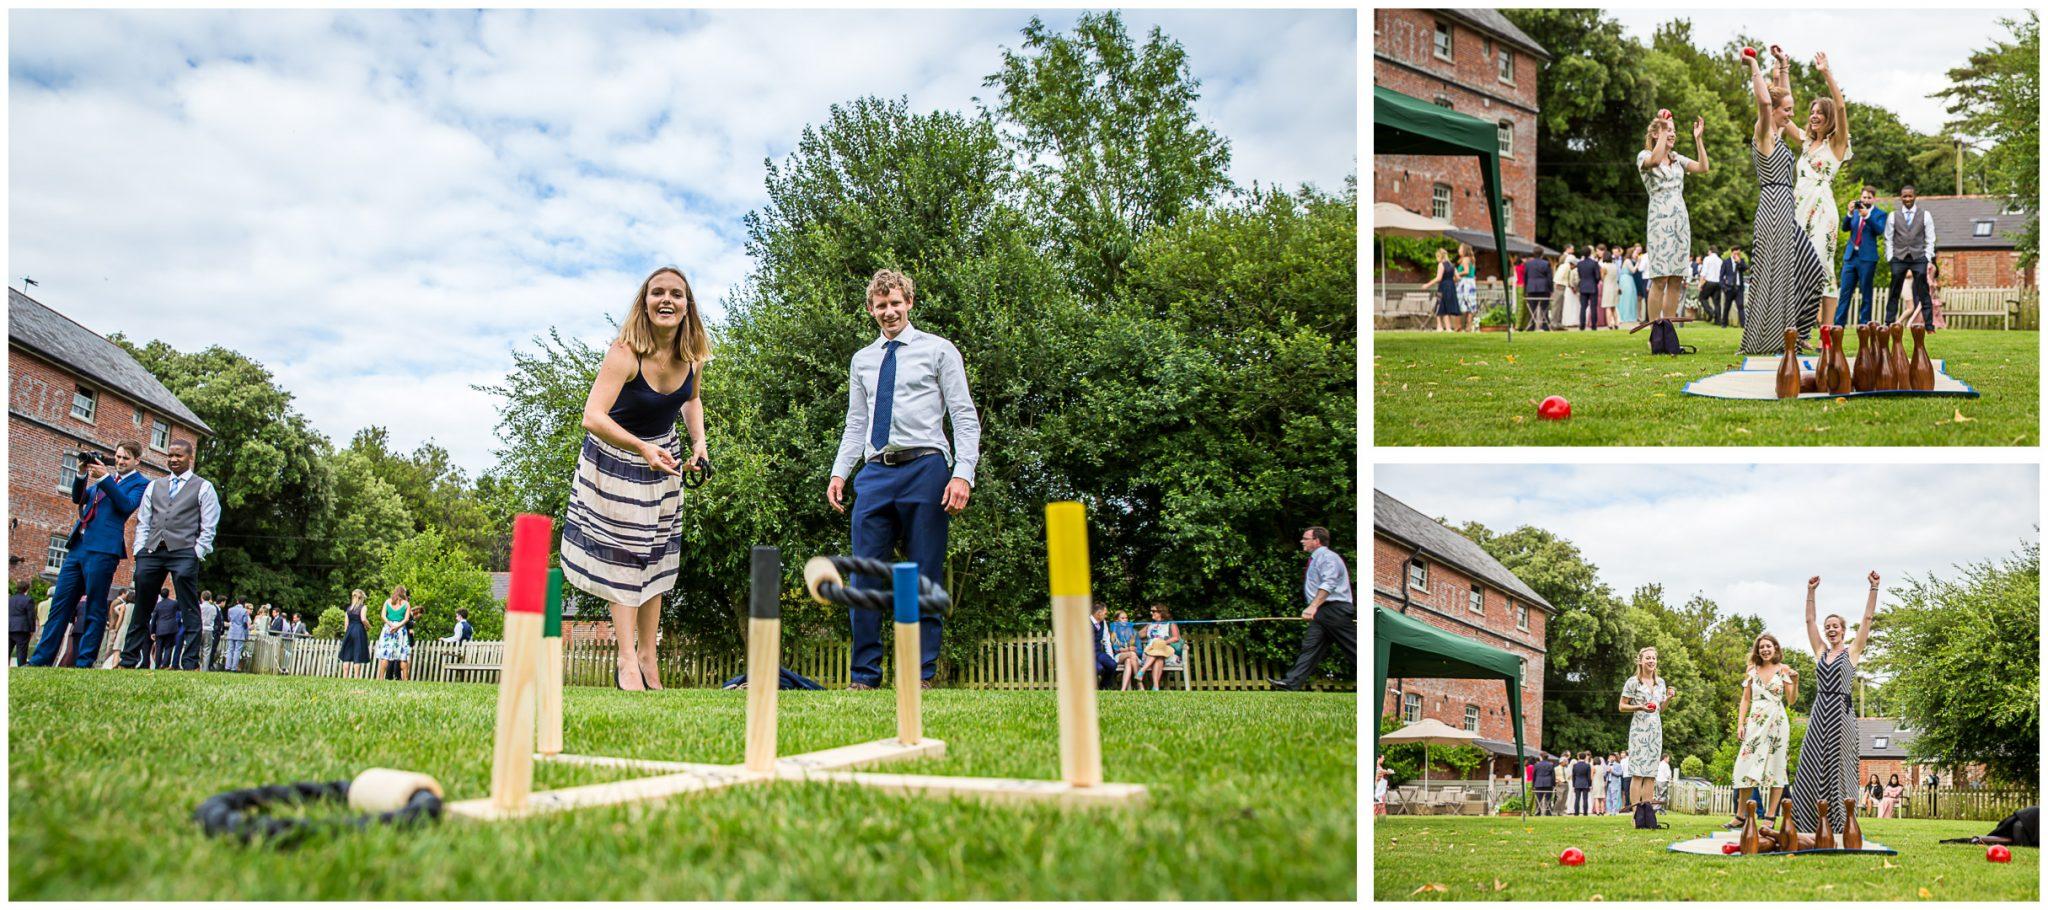 Sopley Mill Summer wedding garden games